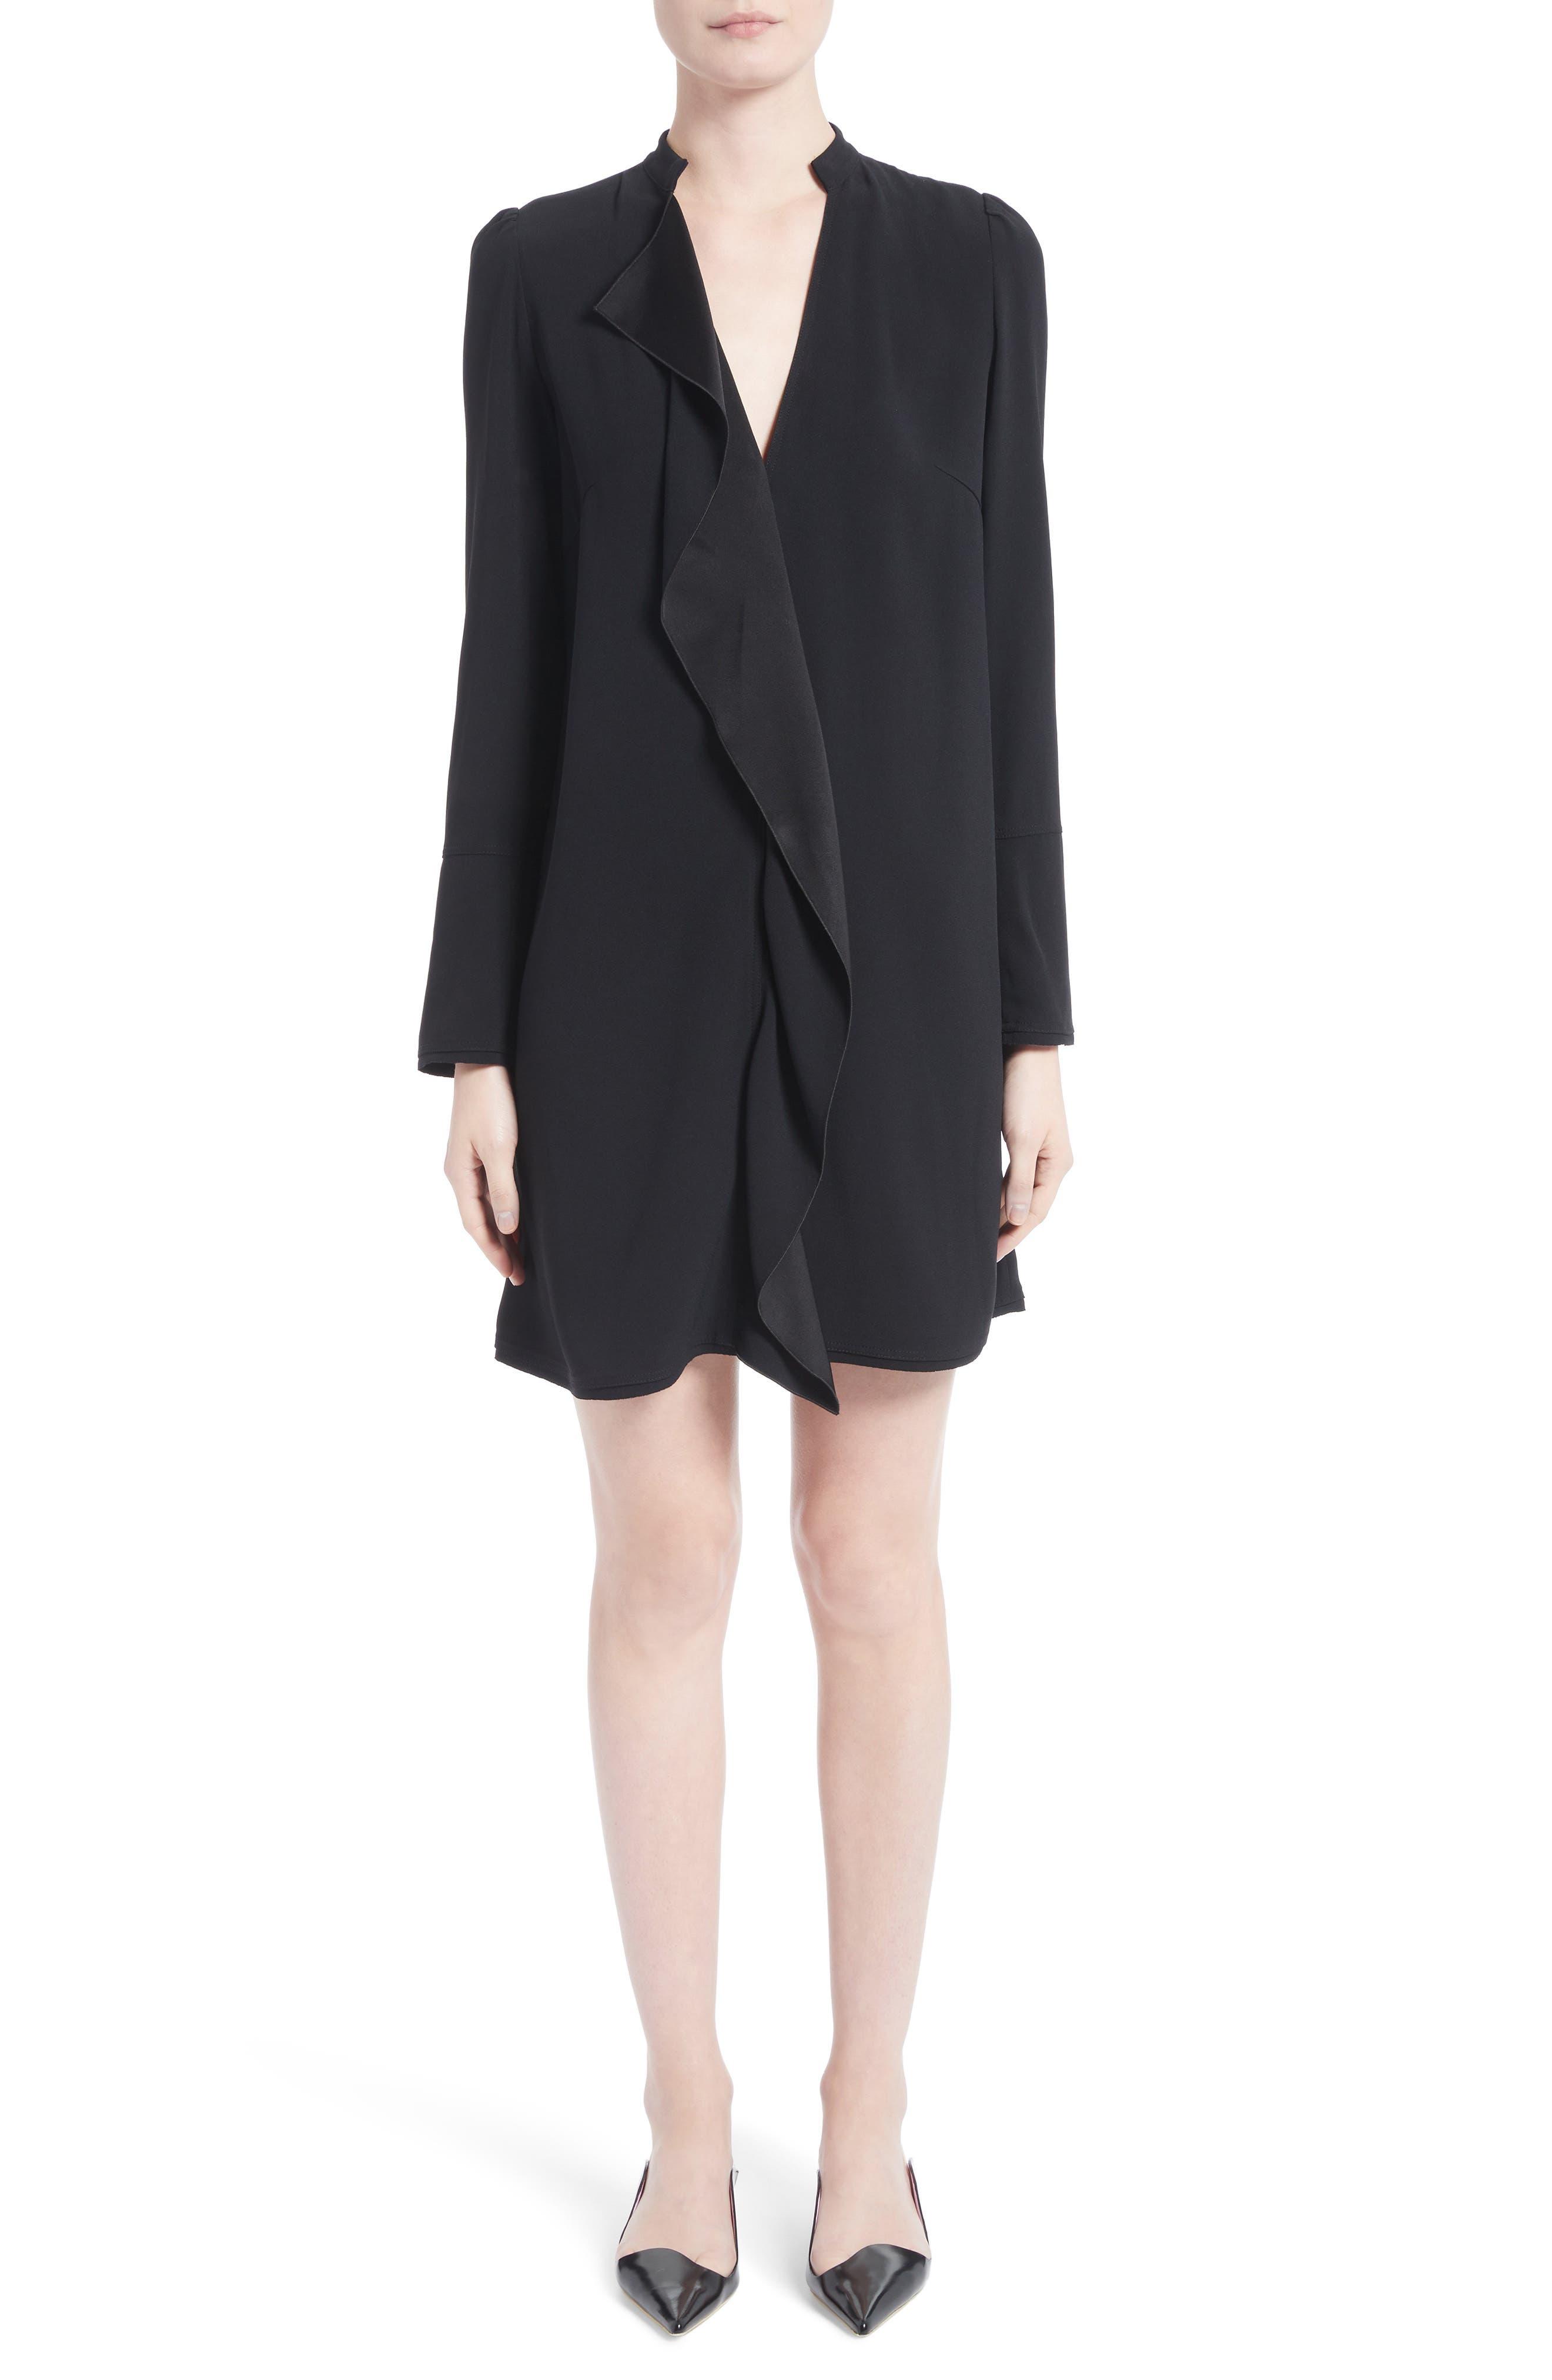 Ruffle Satin Backed Crepe Dress,                             Main thumbnail 1, color,                             Black